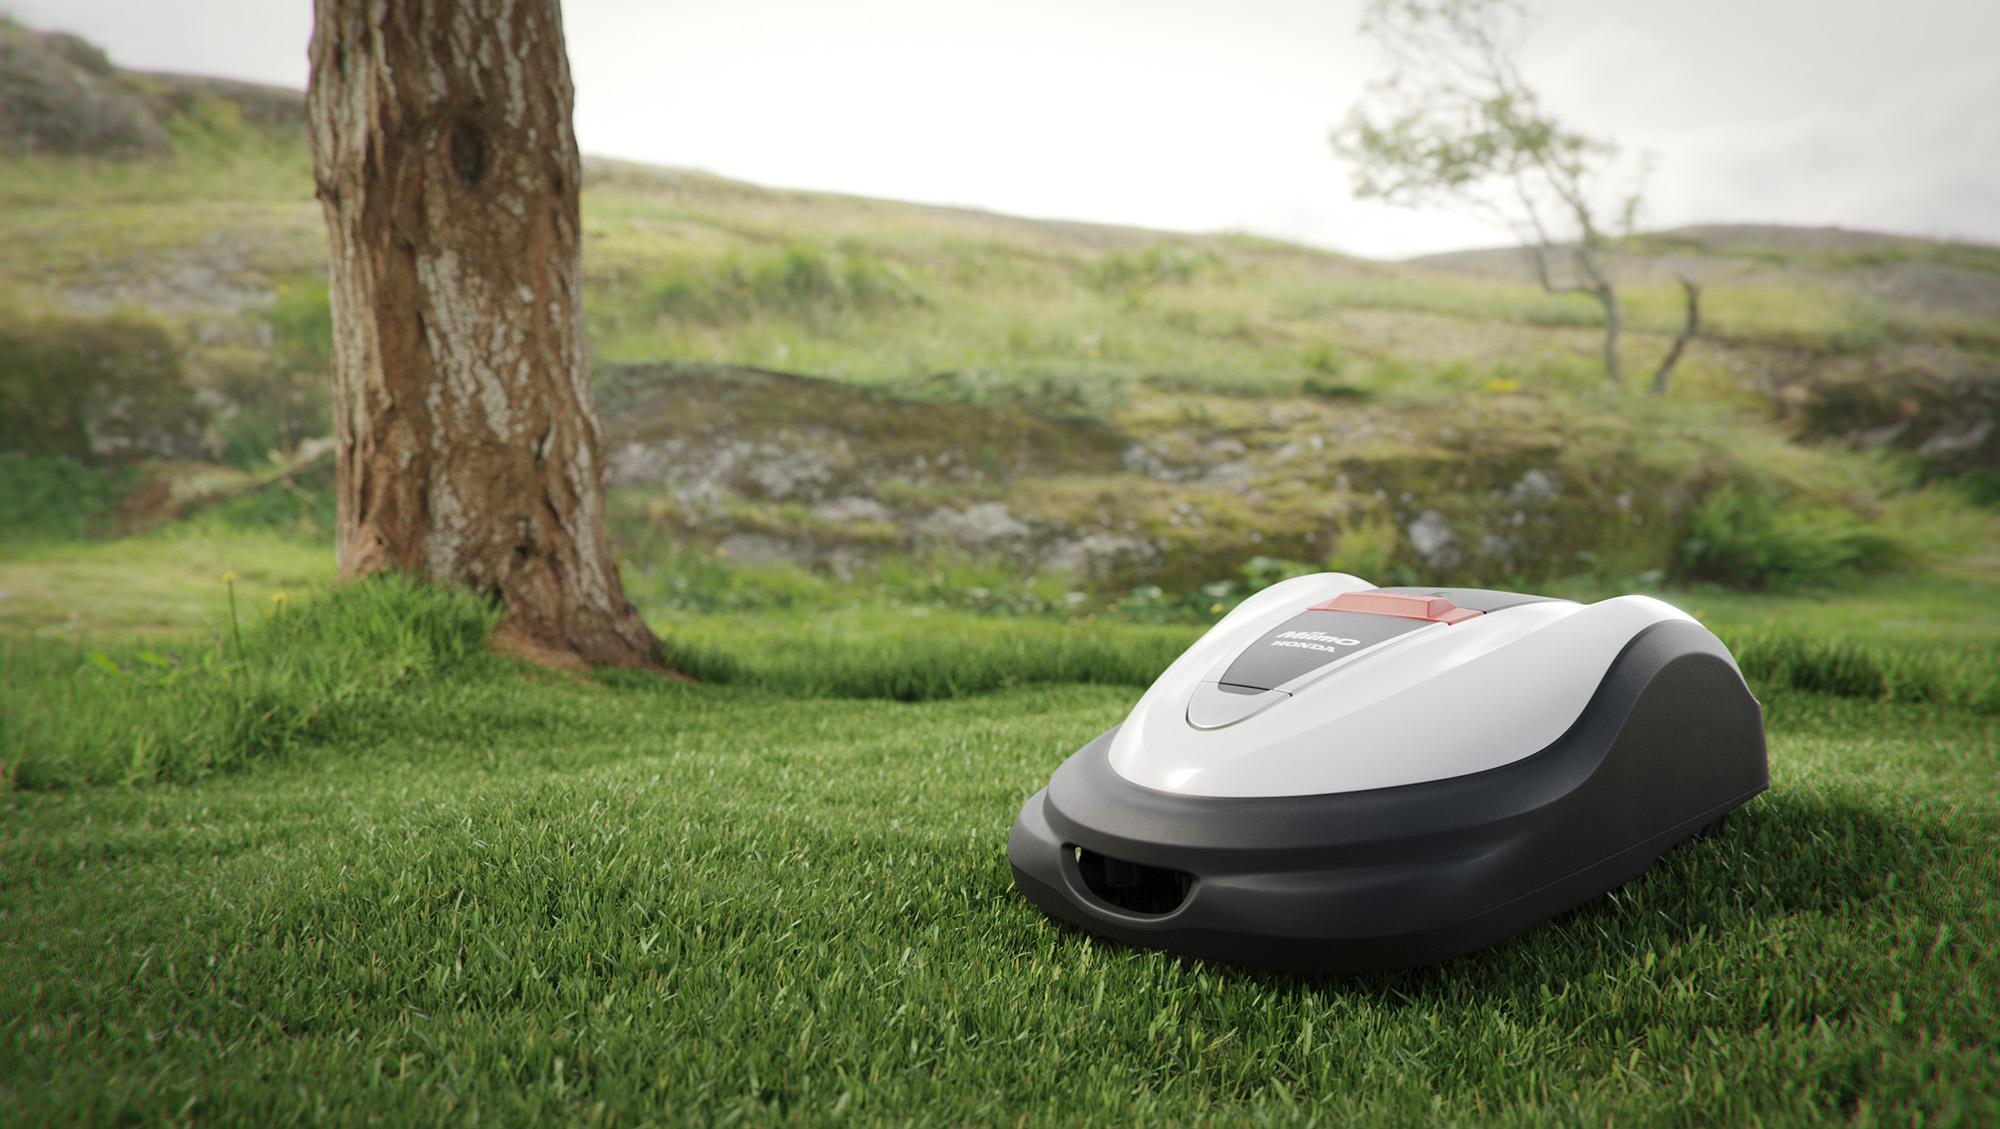 Honda Miimo robotklipper i norsk hage